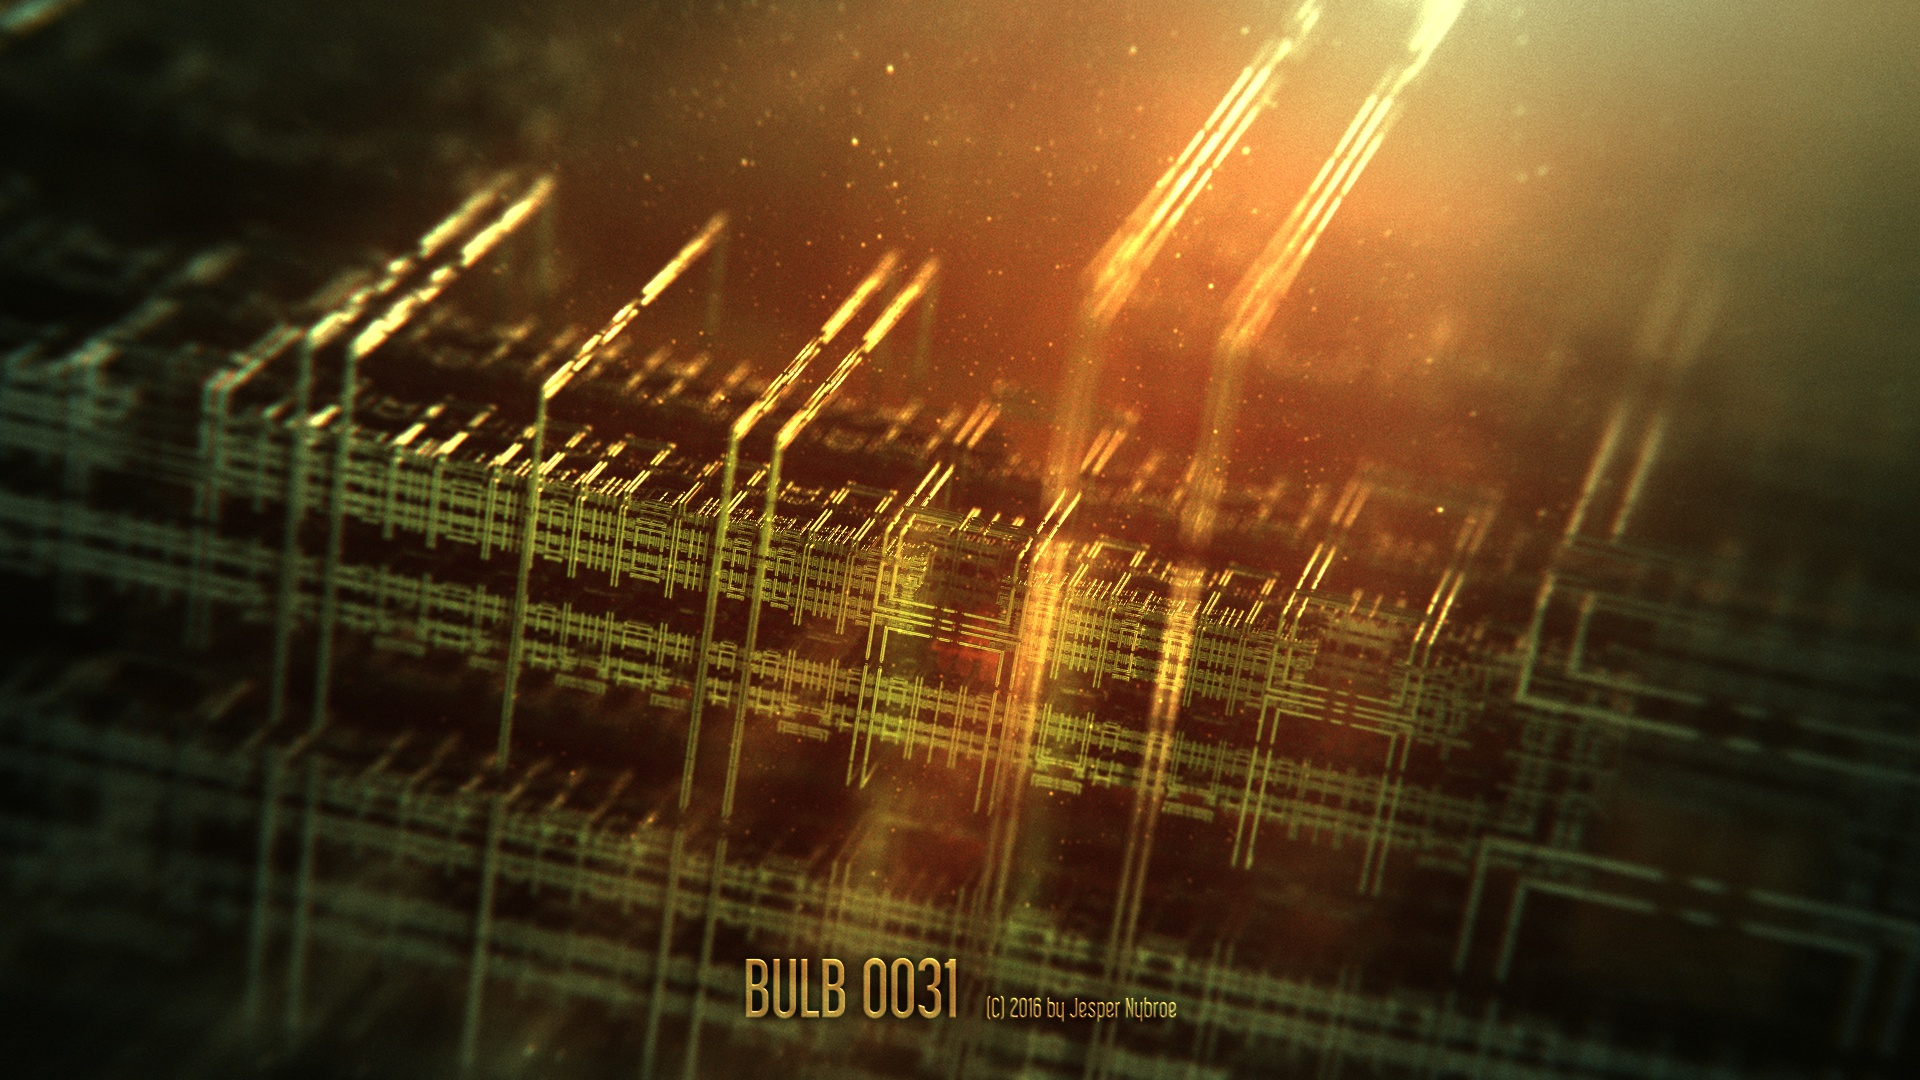 Bulb_0031.0001.jpg